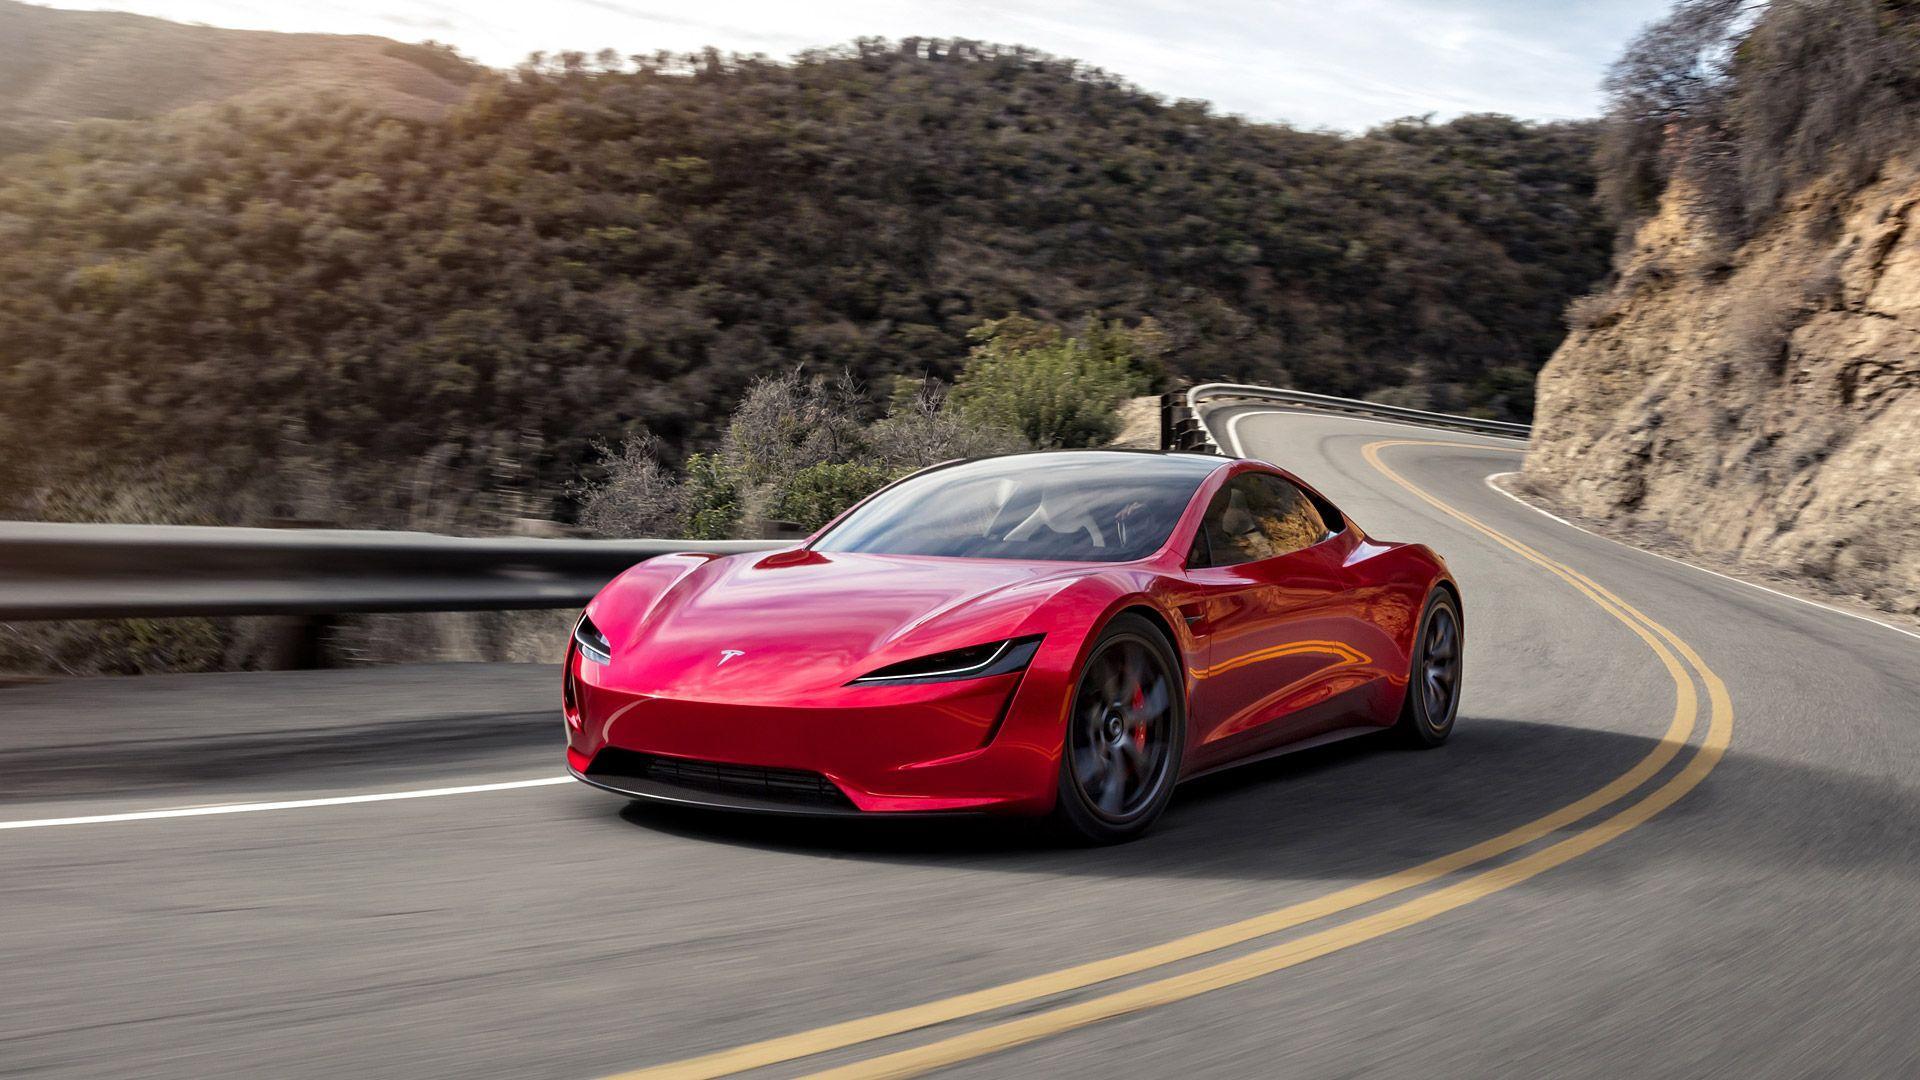 2020 Tesla Roadster >> Tesla Roadster 2020 Wallpapers Top Free Tesla Roadster